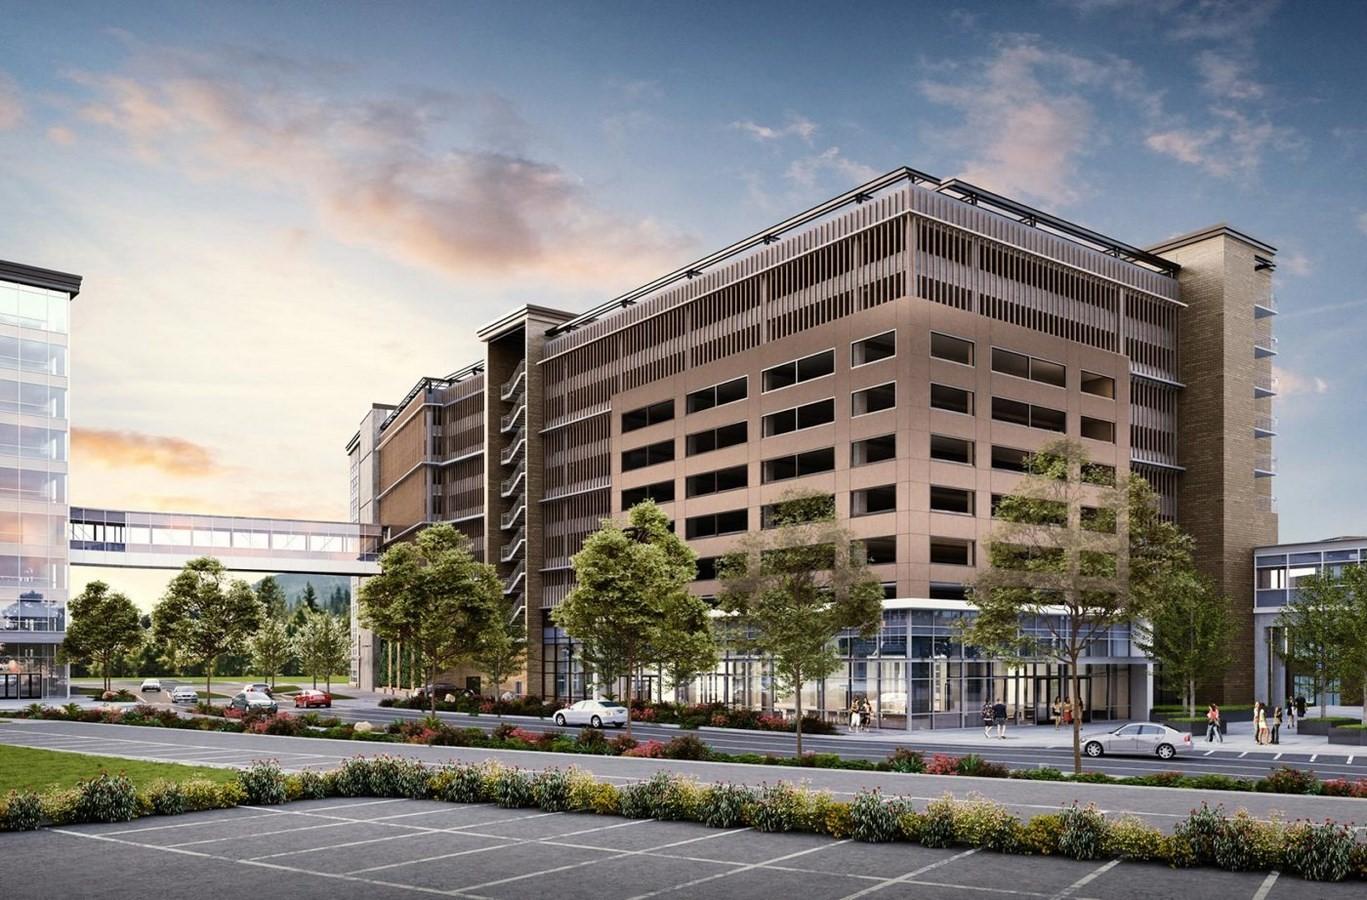 Costco Wholesale Headquarters Campus (Issaquah, Washington) - Sheet2